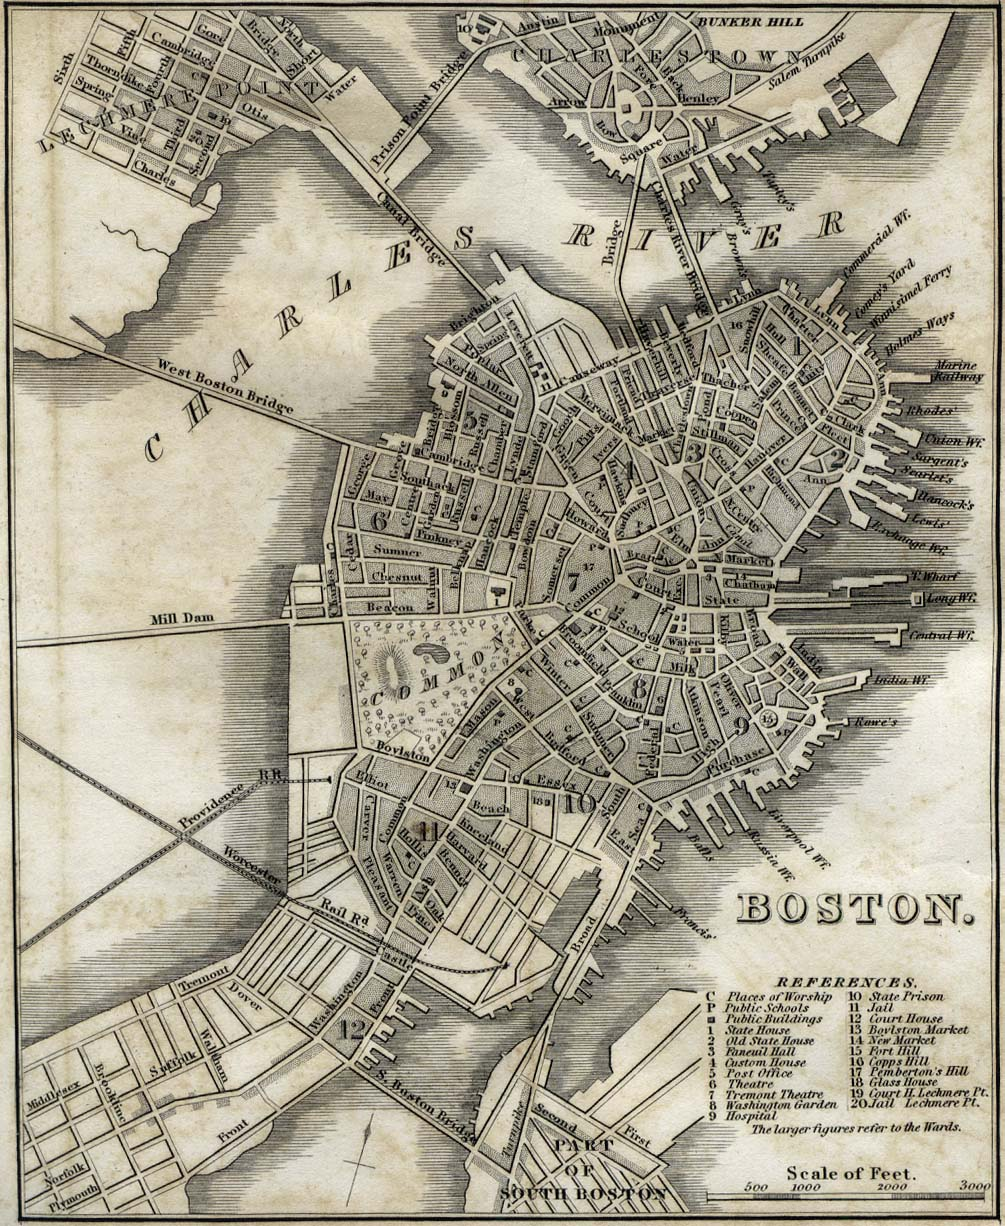 Boston City Map 1842